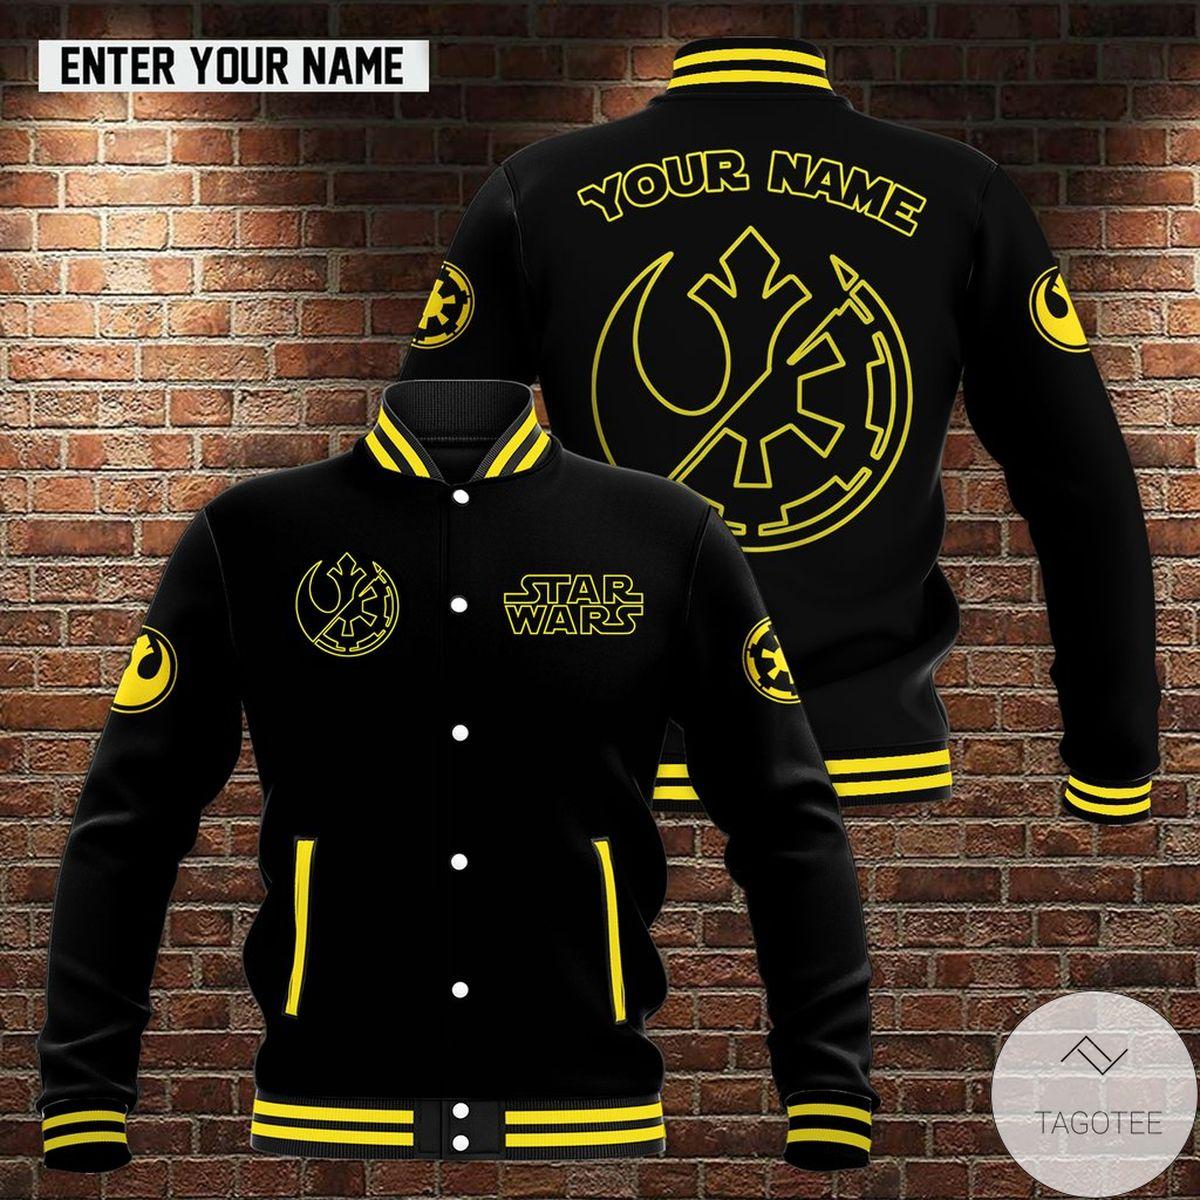 Personalized Star Wars Baseball Jacket